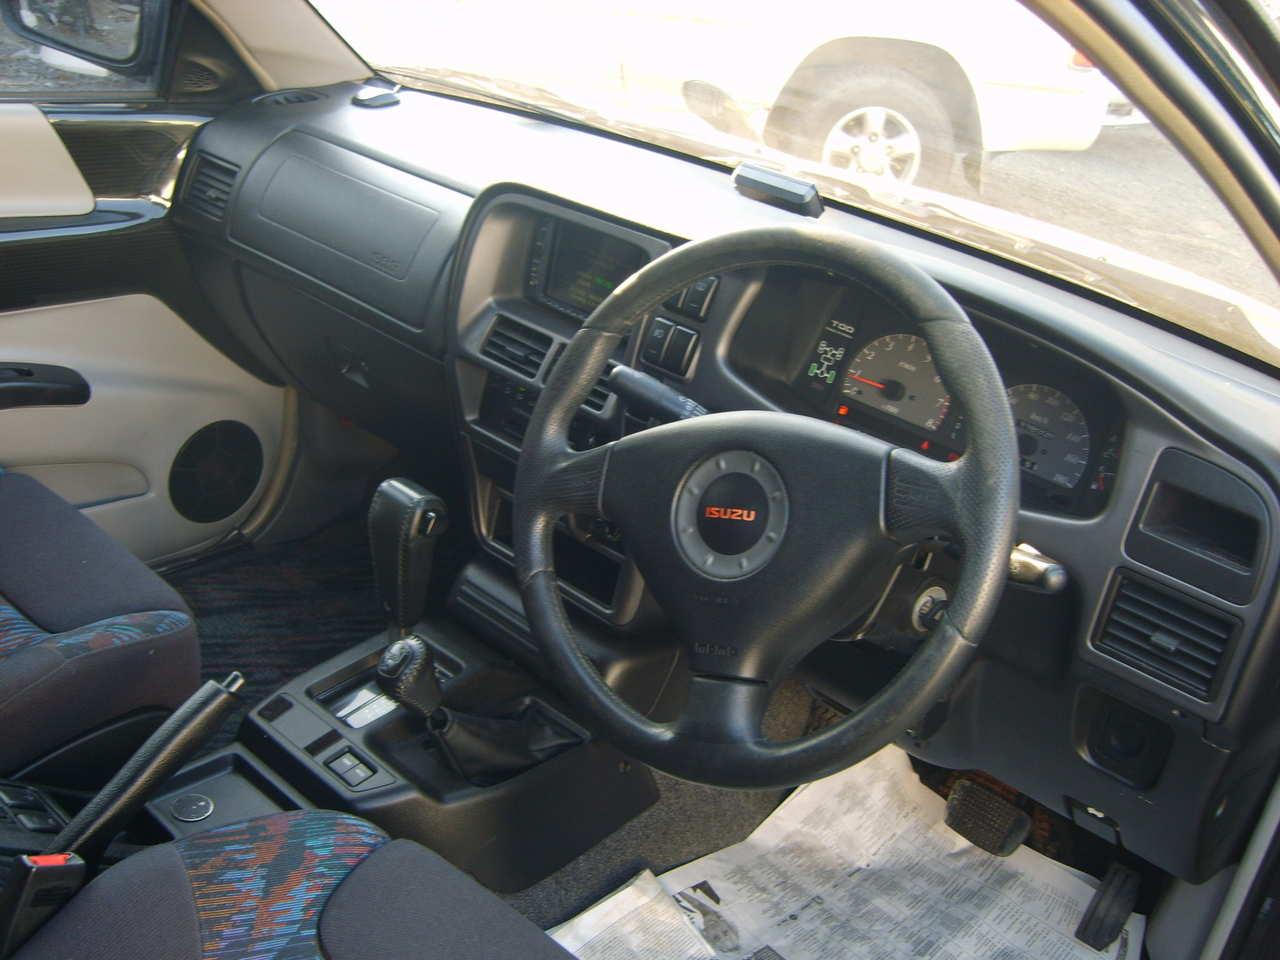 2000 Isuzu Vehicross Photos, 3.2, Gasoline, Automatic For Sale